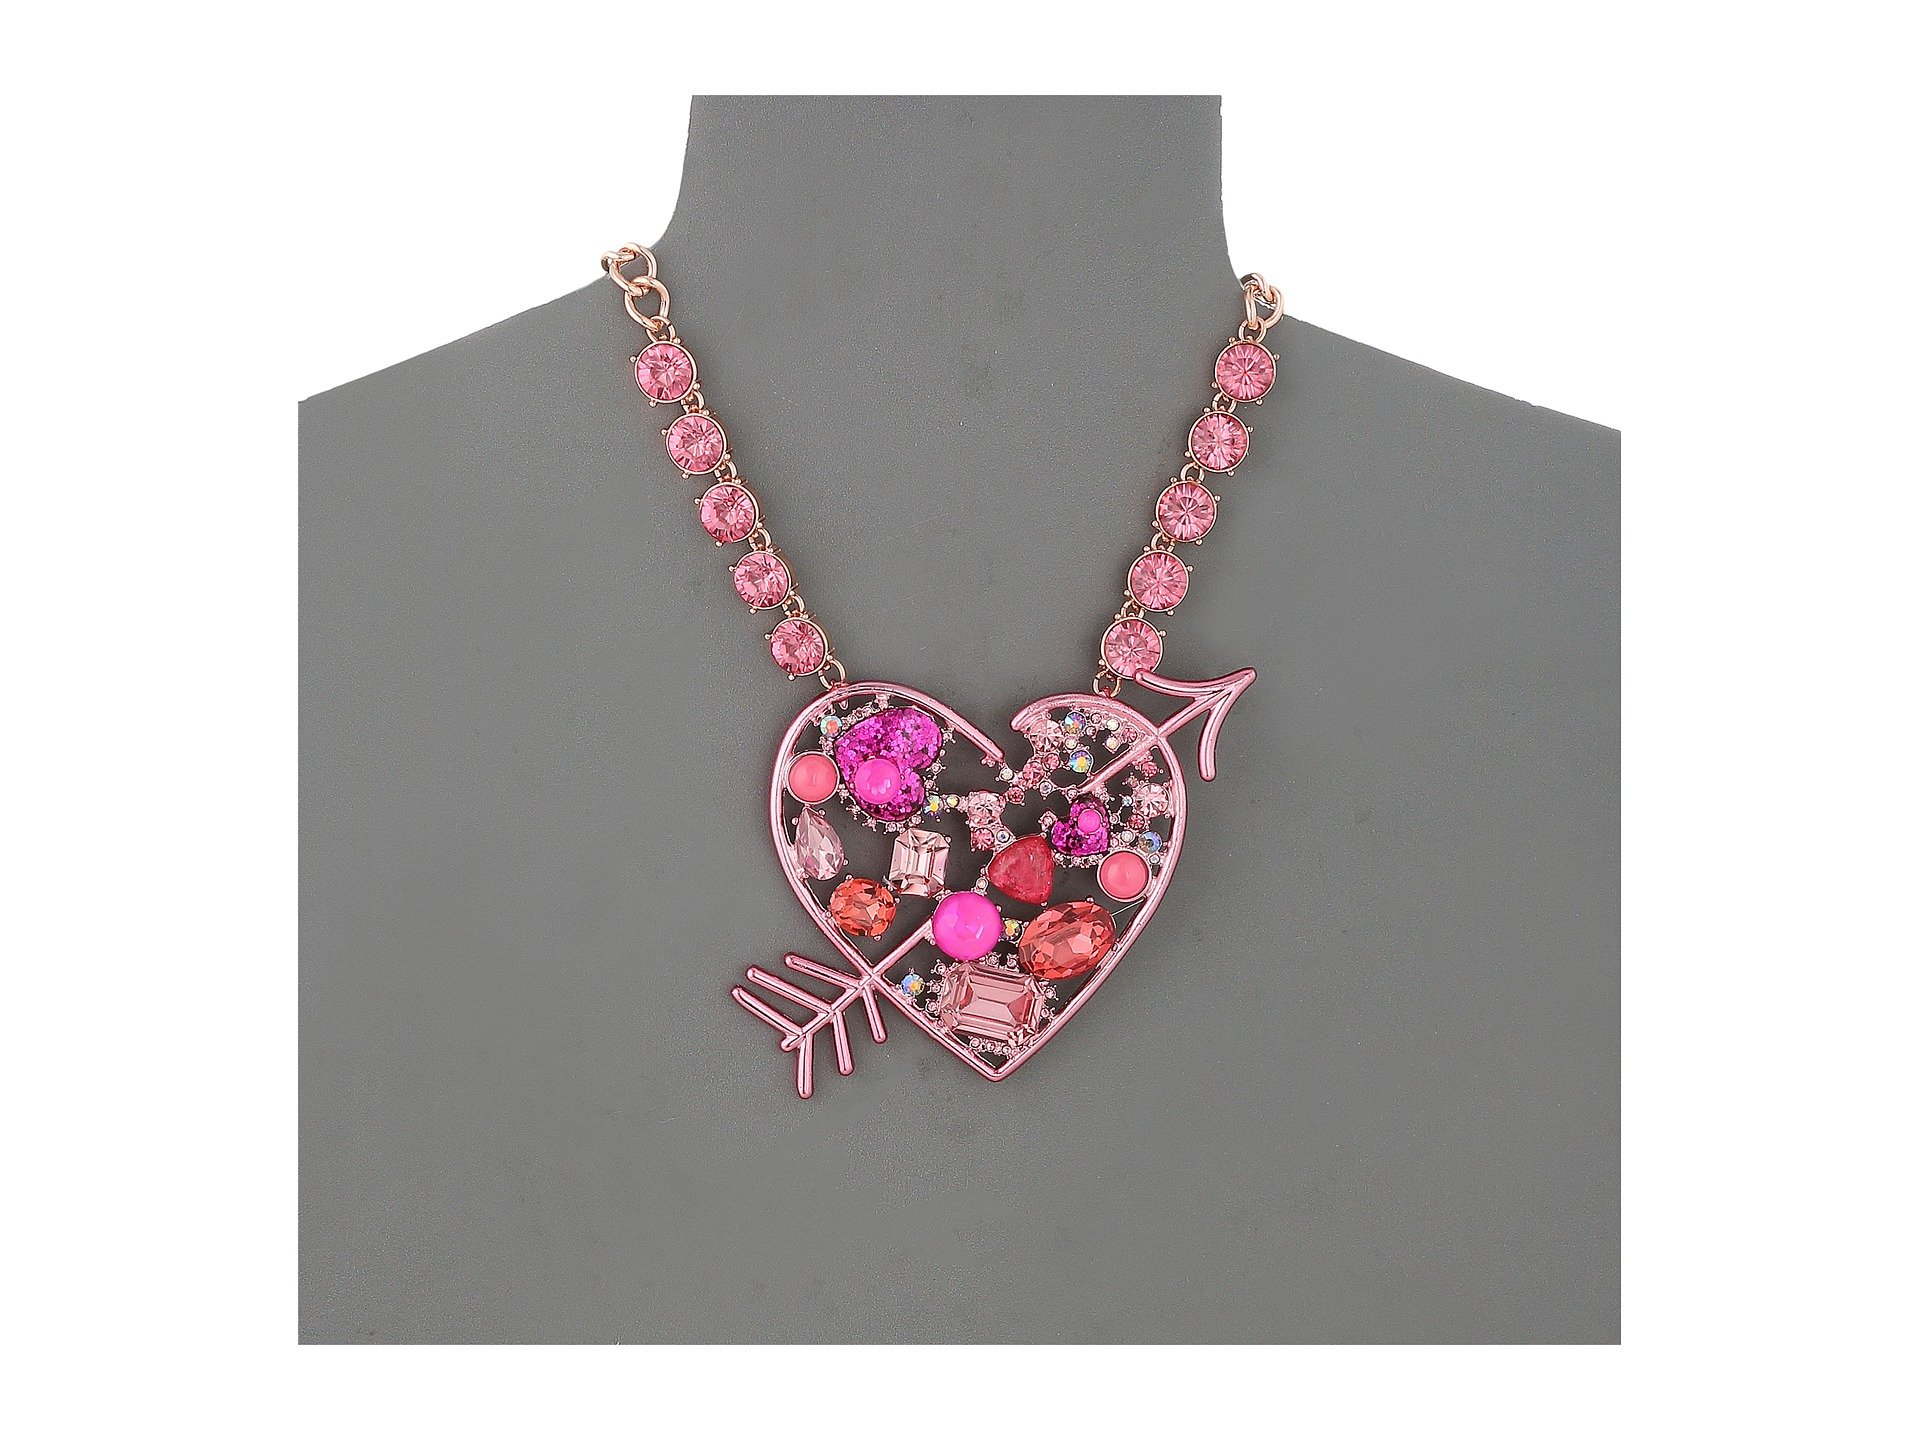 Betsey johnson pink heart pendant necklace at zappos aloadofball Gallery